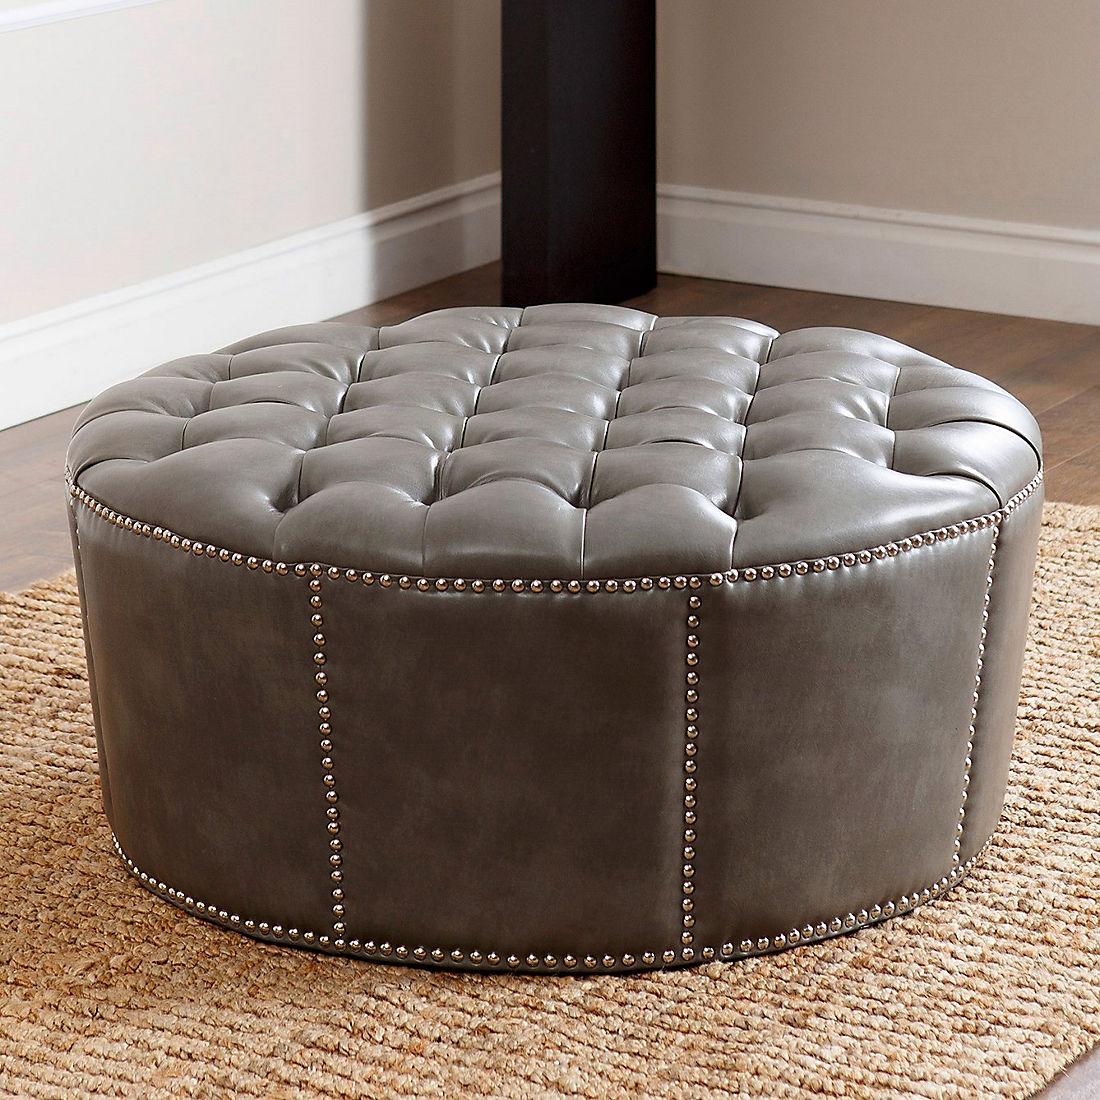 Astounding Abbyson Living Portwood Leather Nailhead Trim Round Ottoman Gray Bralicious Painted Fabric Chair Ideas Braliciousco